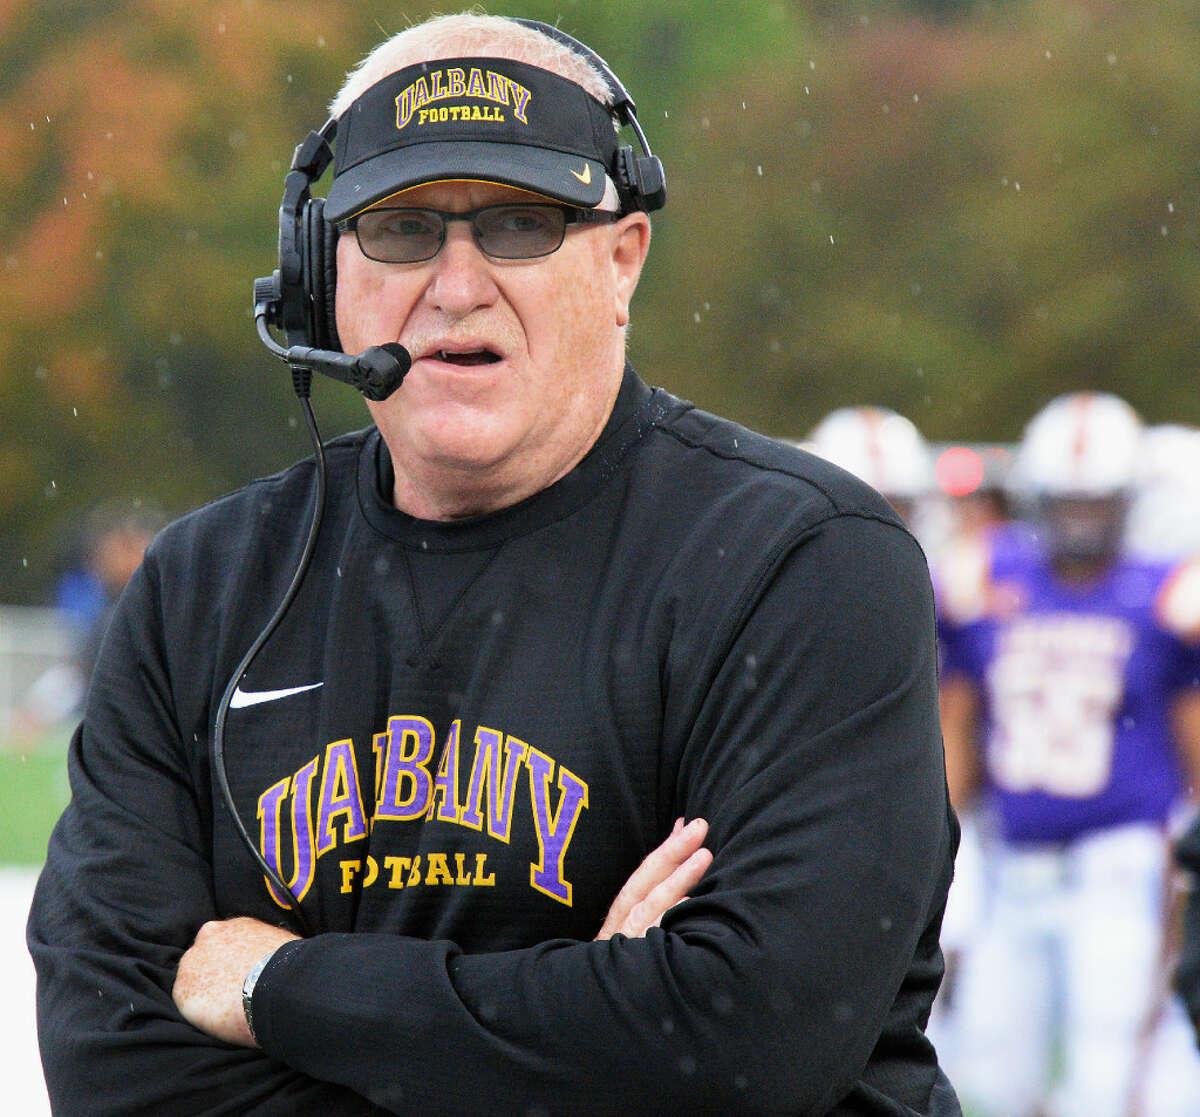 UAlbany football coach Greg Gattuso said his team had a better NCAA playoff resume than New Hampshire. (John Carl D'Annibale/Times Union)